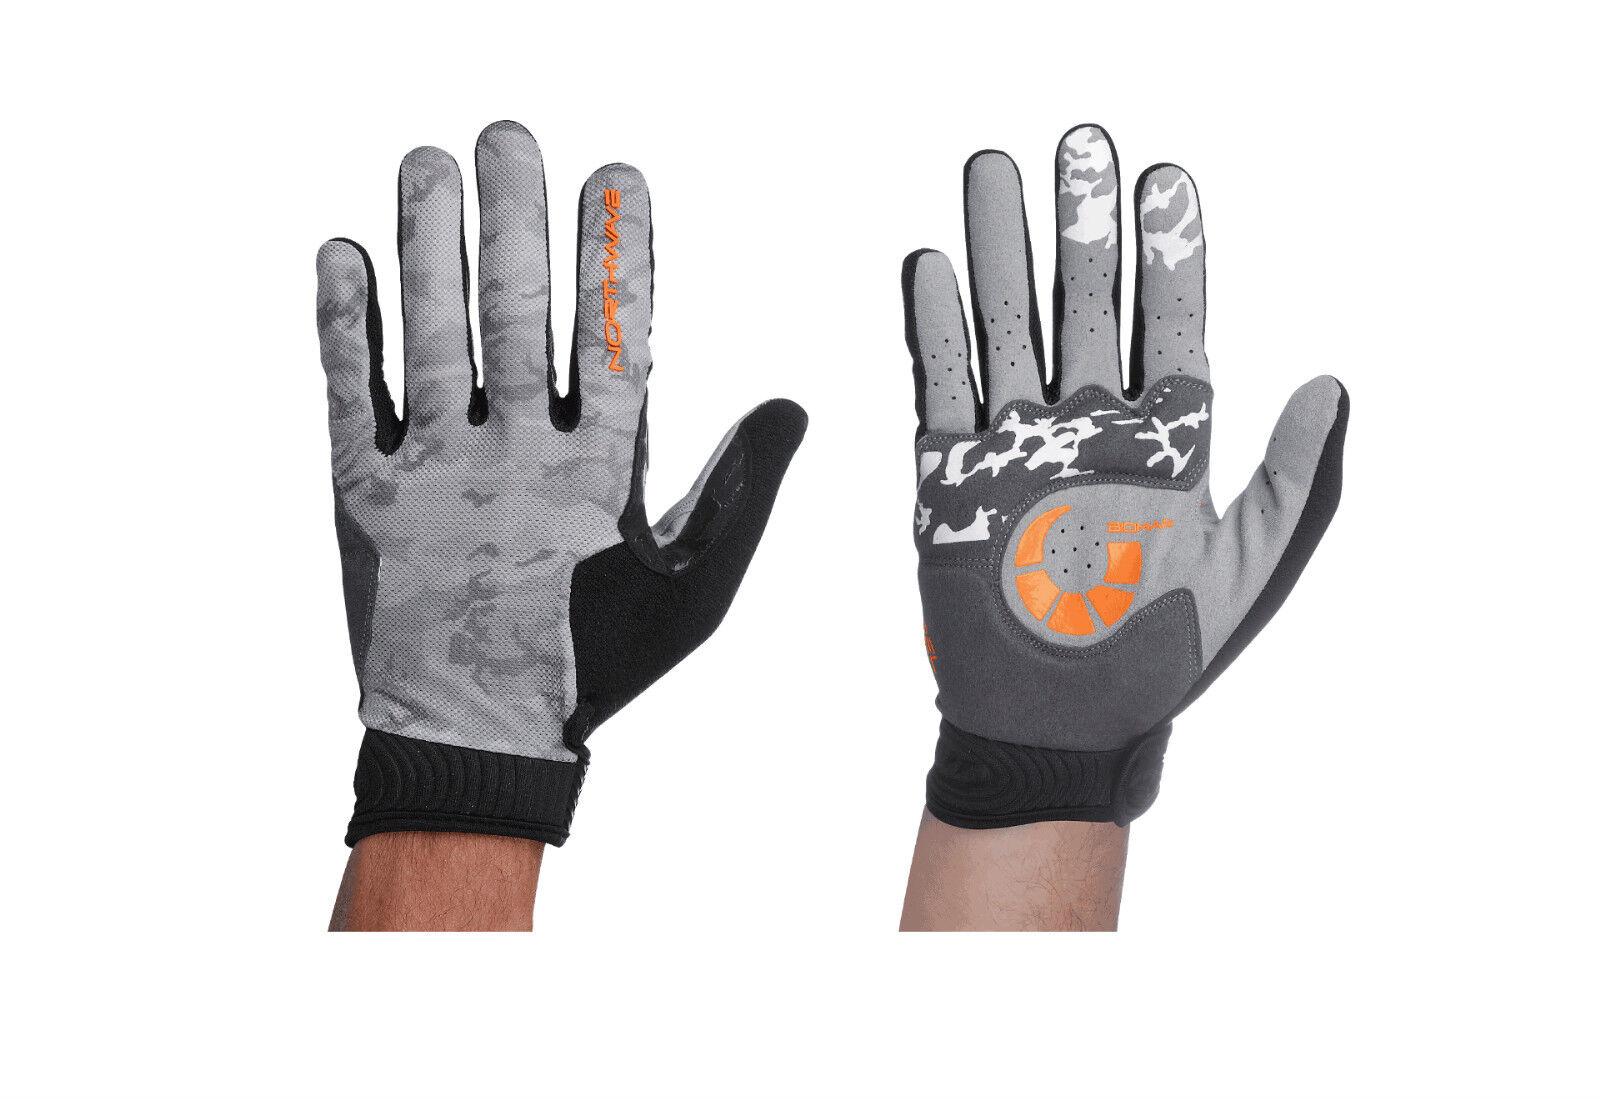 Wimper Handschuhe Sommer full Northwave  MTB air Kol.-camo Sommer MT  best choice